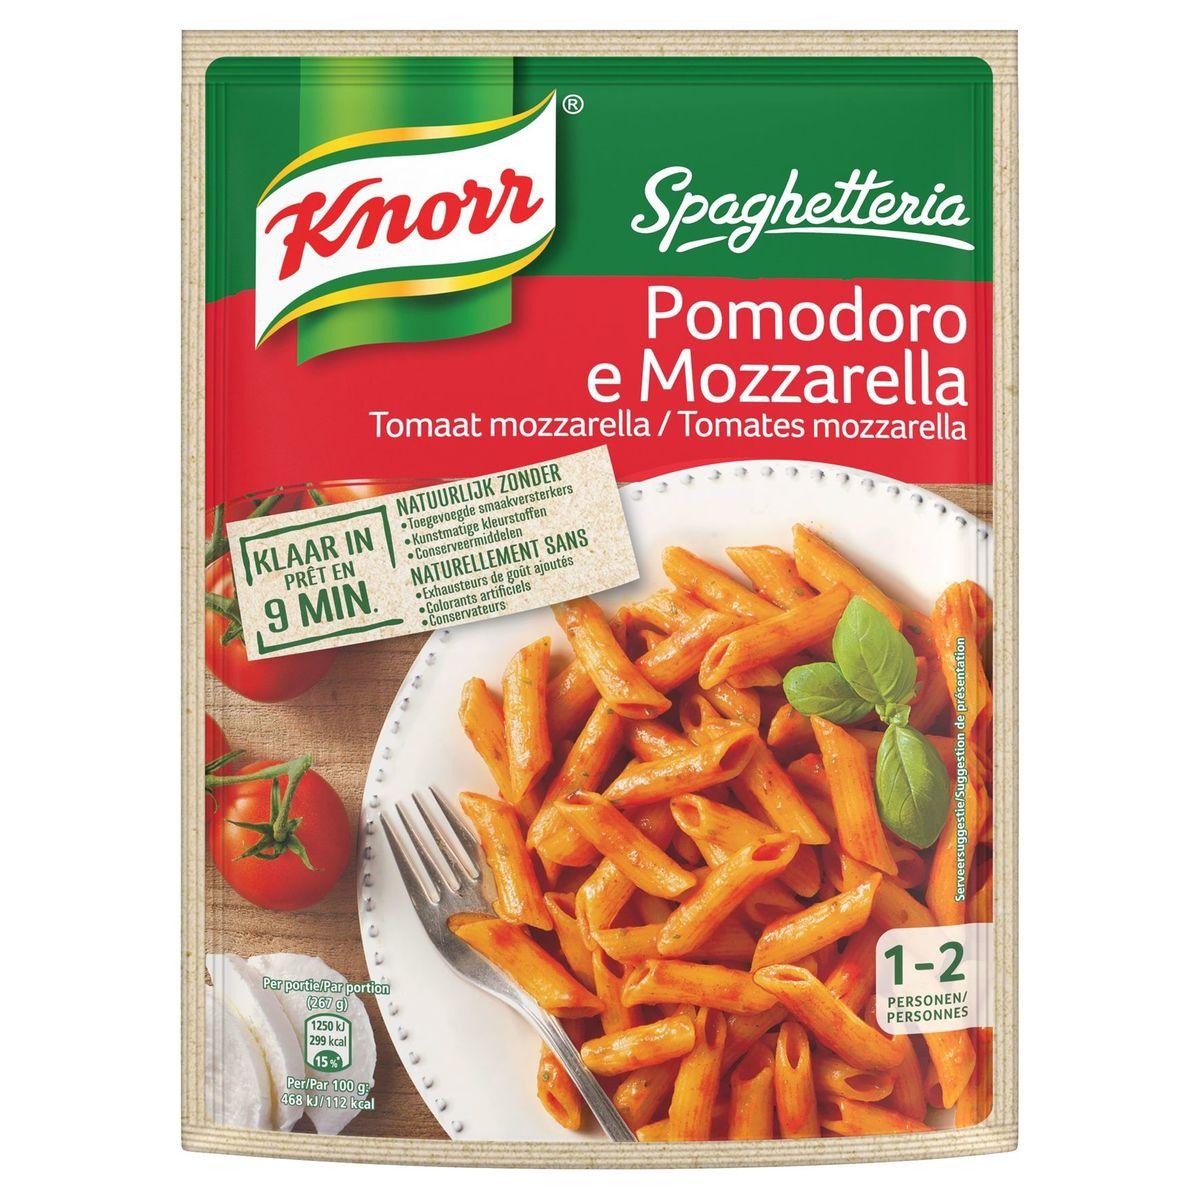 Knorr Spaghetteria Pomodoro Mozzarella 163 g